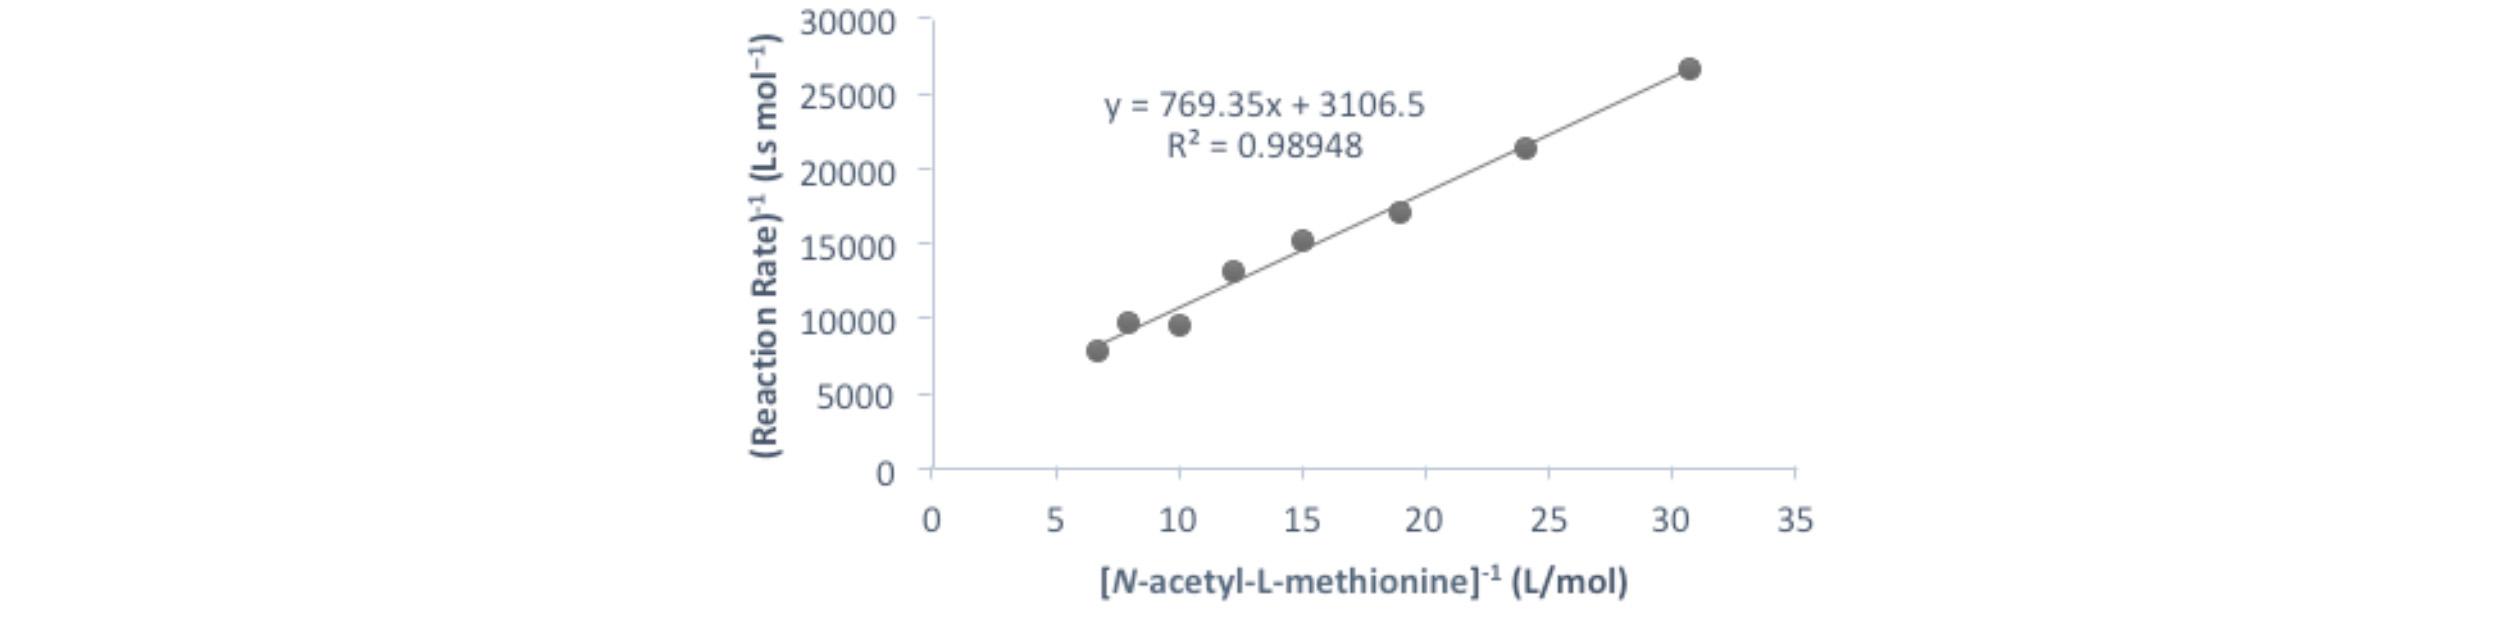 Figure 4.  Lineweaver-Burk plot of the reaction.